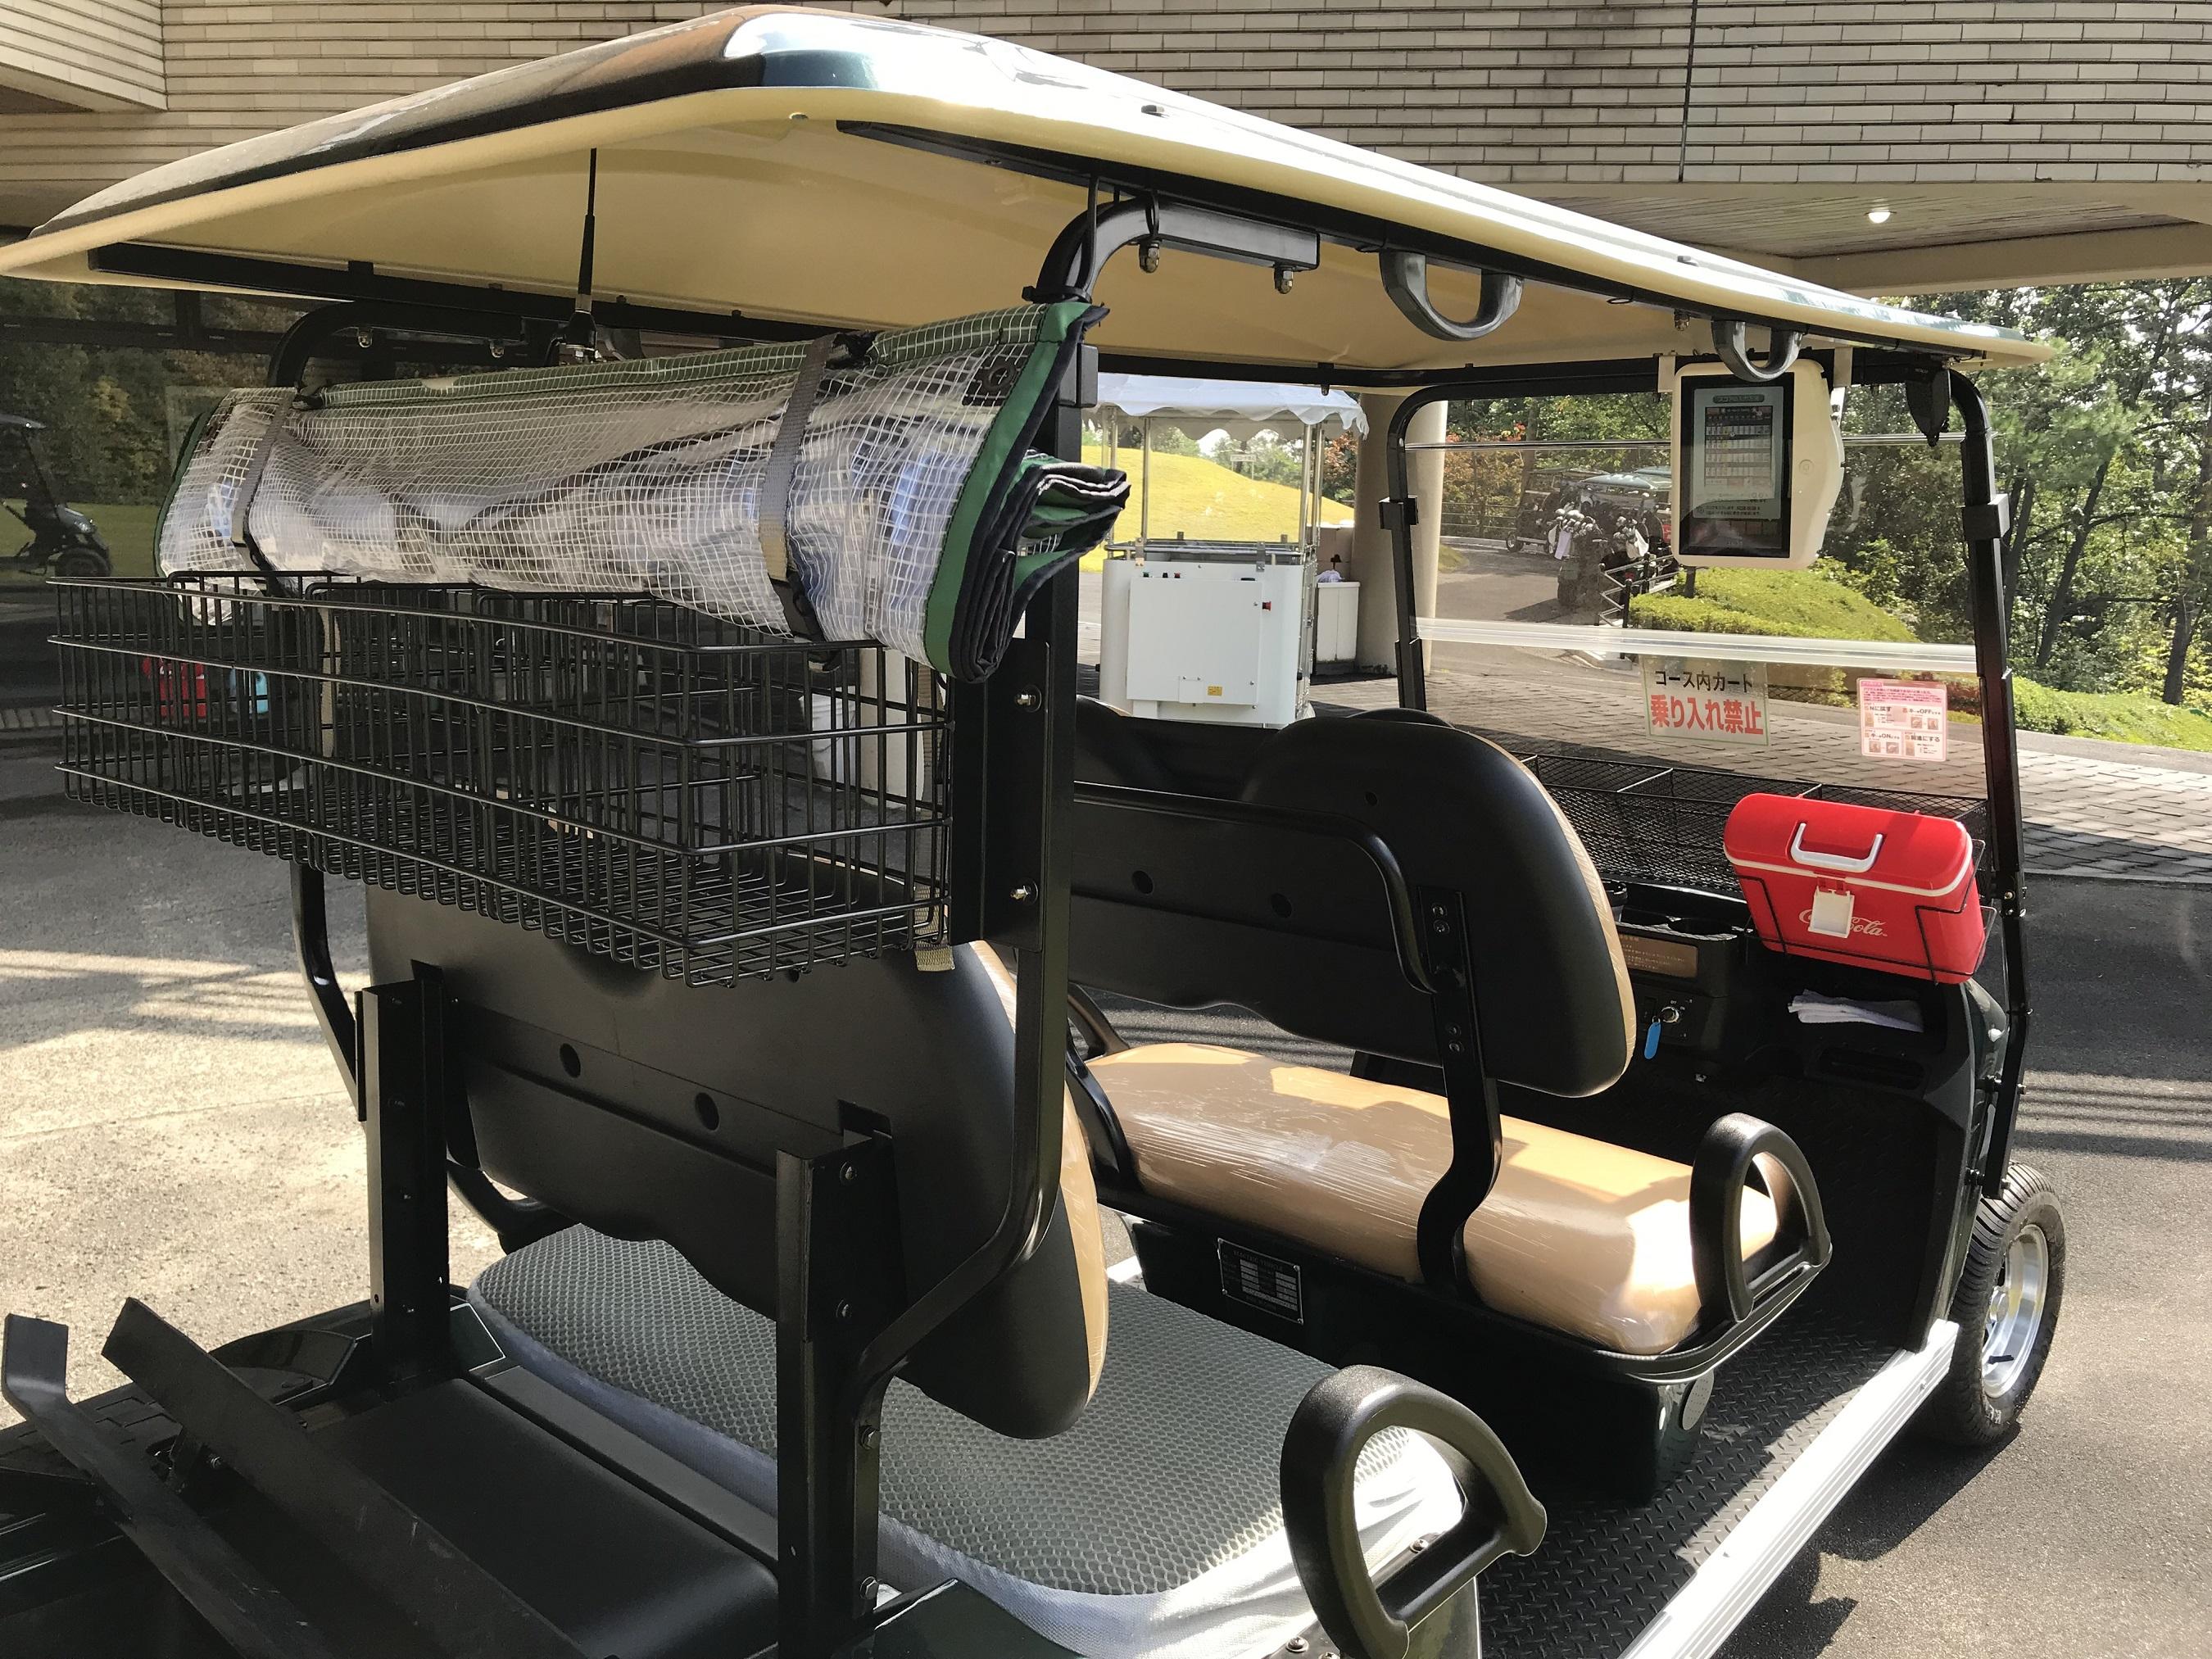 EVゴルフカート全台にゴルフナビゲーションシステム「マーシャルナビ」を搭載